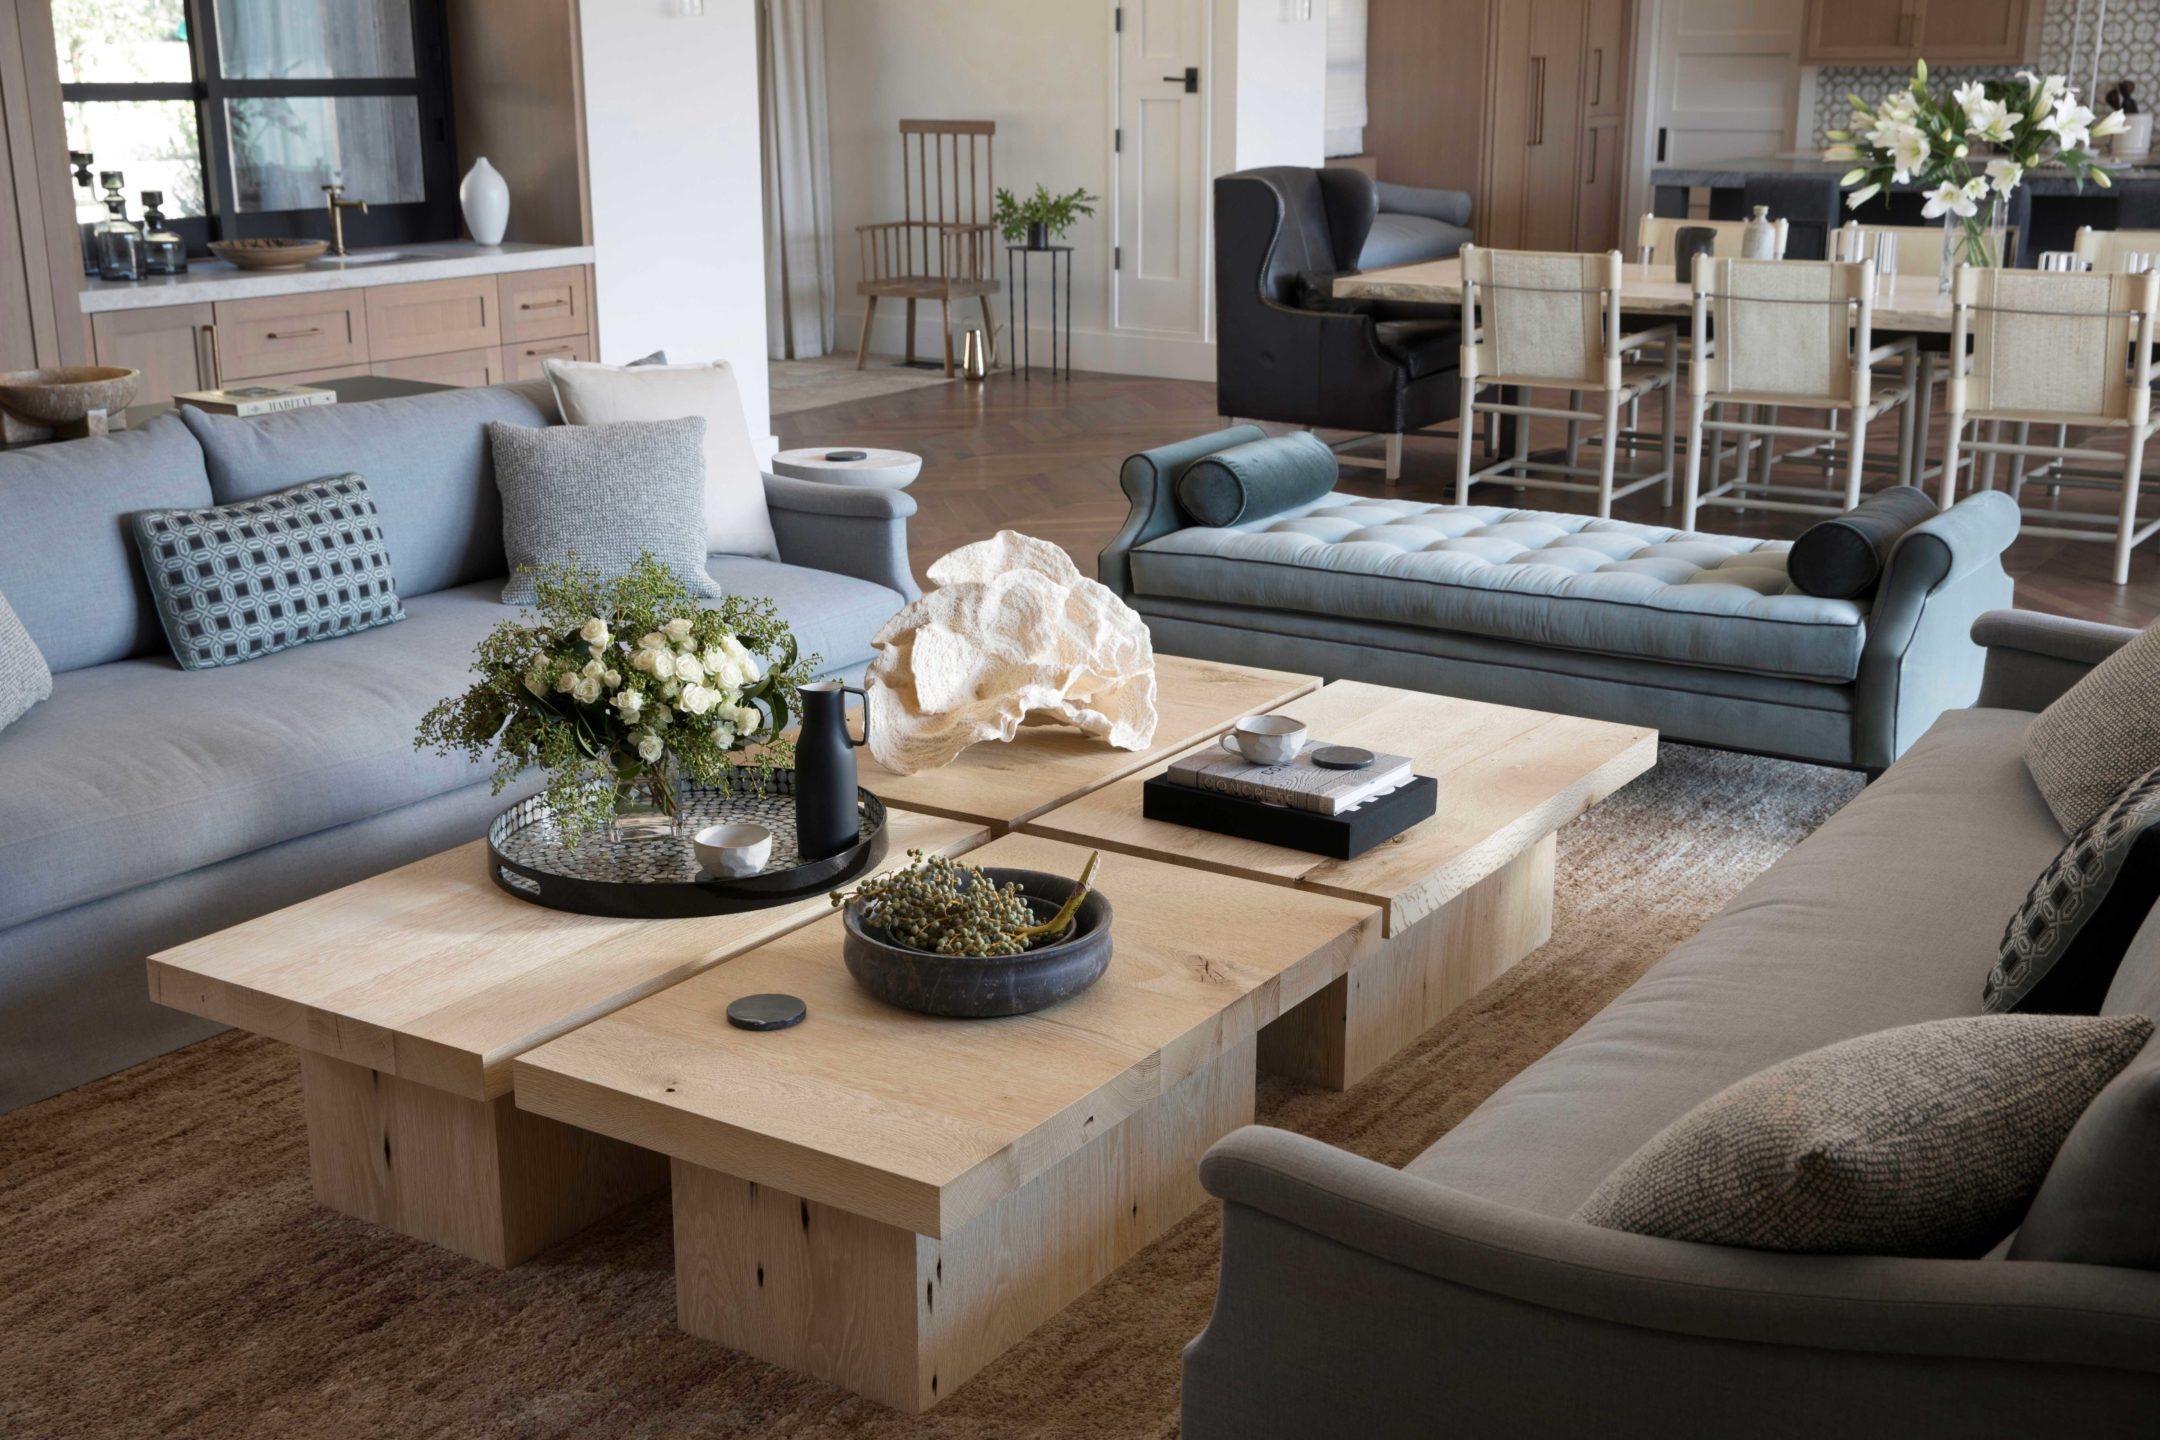 Jennifer_robins_interiors_projects_st_helena_interior_LR_living_room9Conn_09_HR